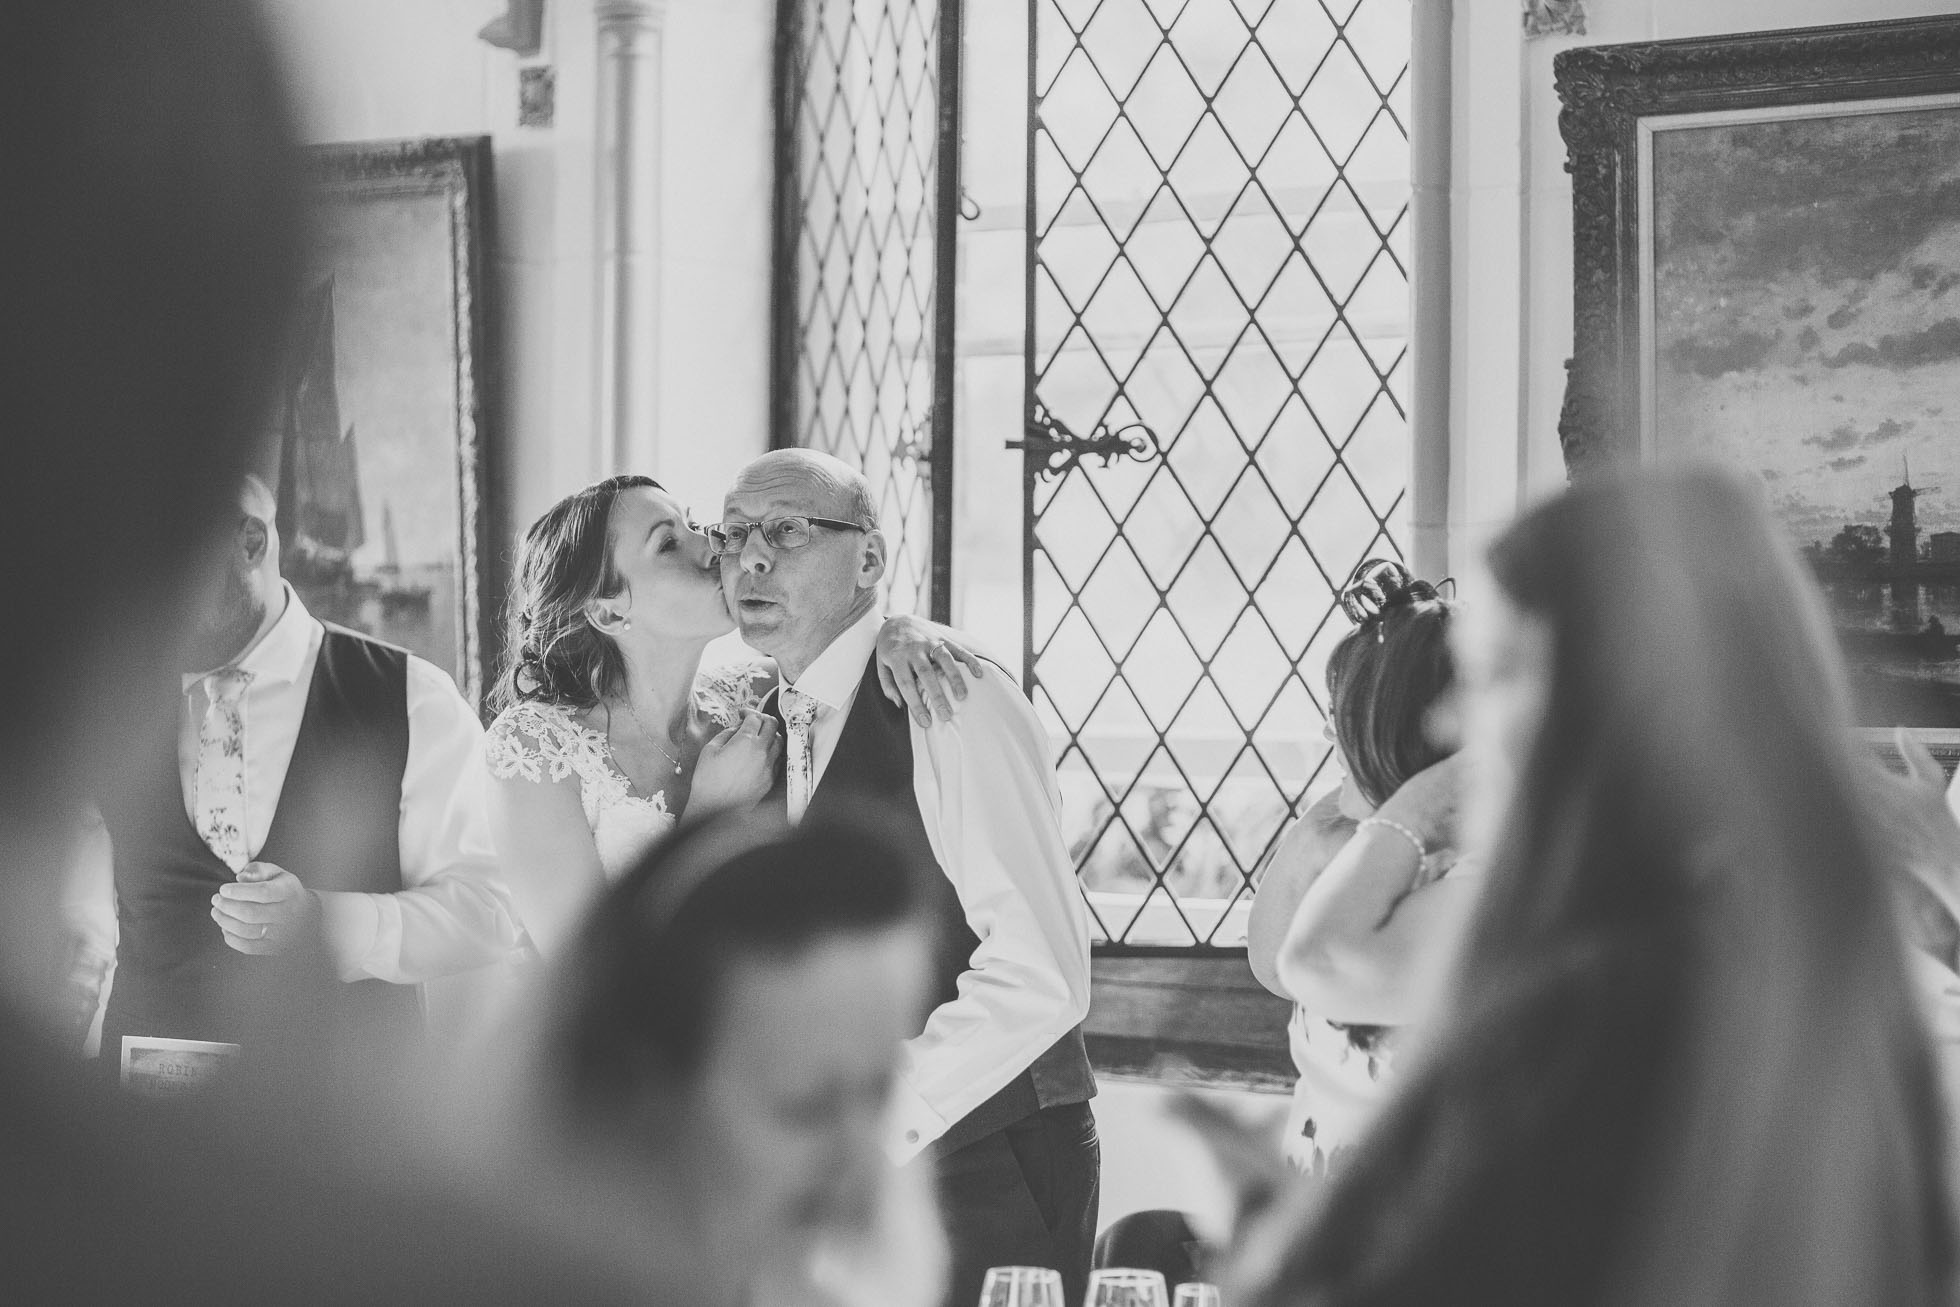 denton-hall-wedding-photographer-53.jpg